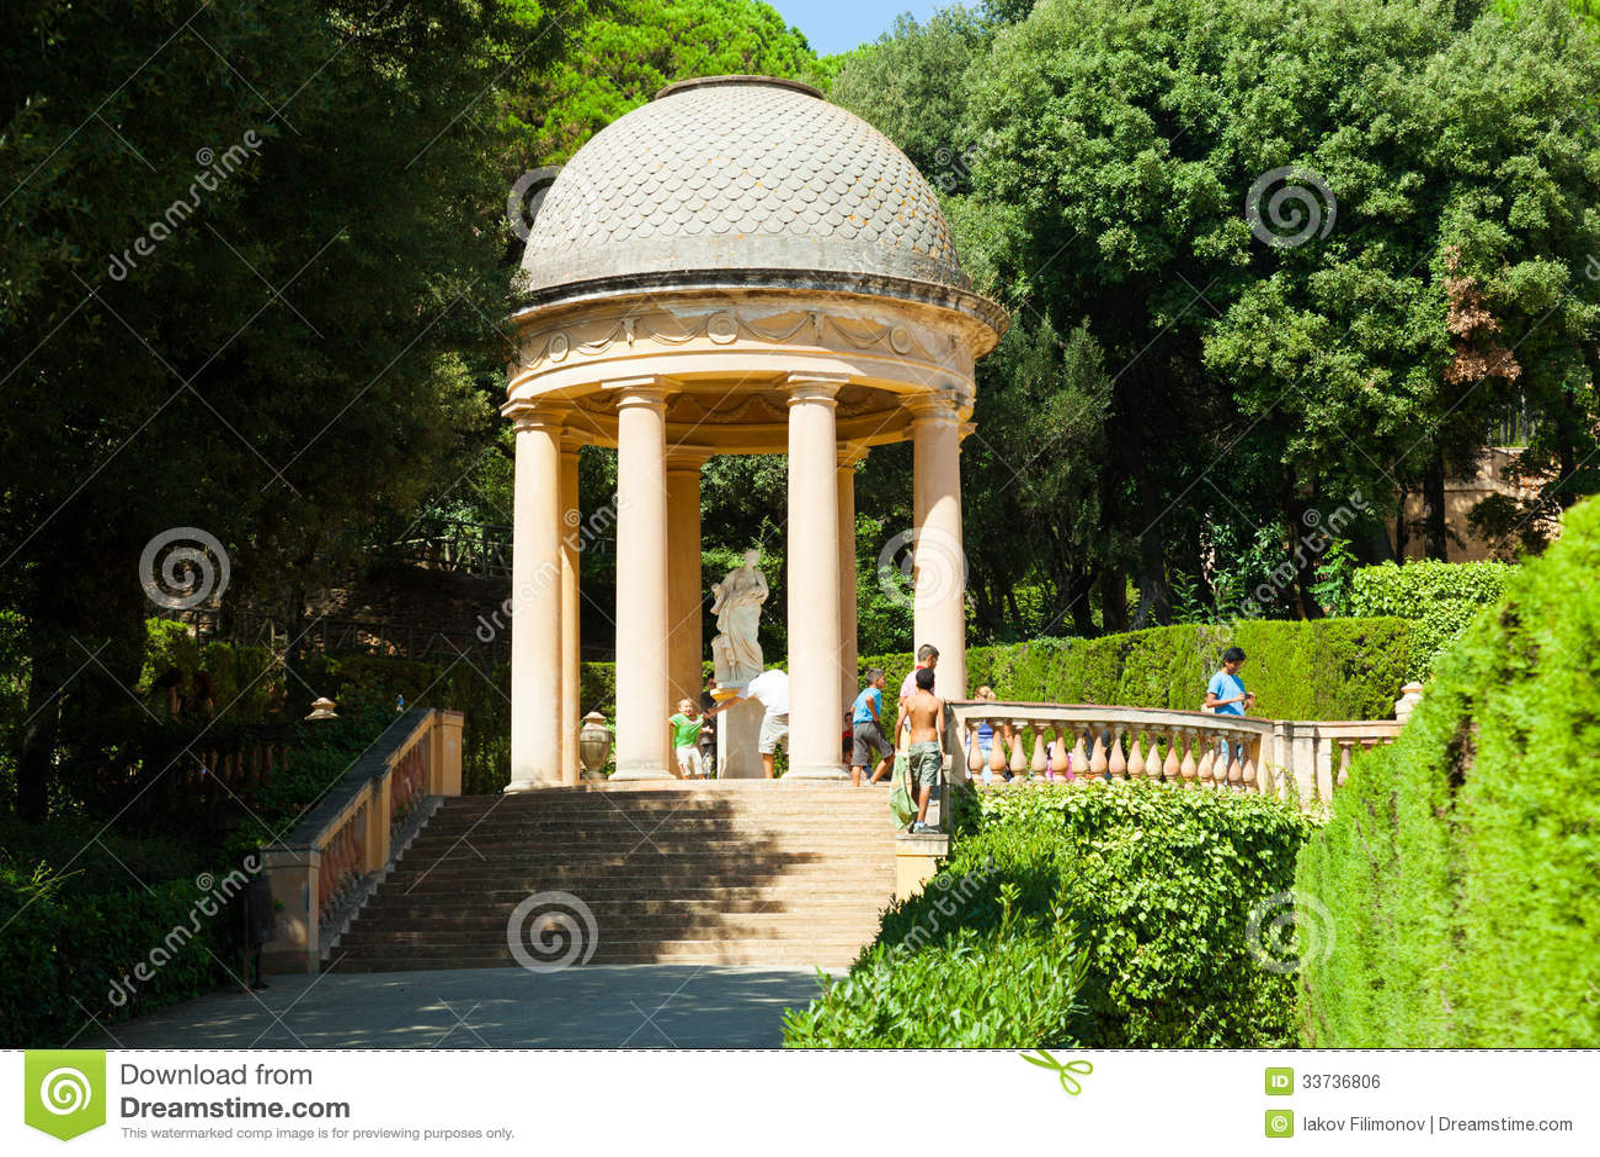 Павильон Danae на Parc del Laberint de Horta в Барселоне